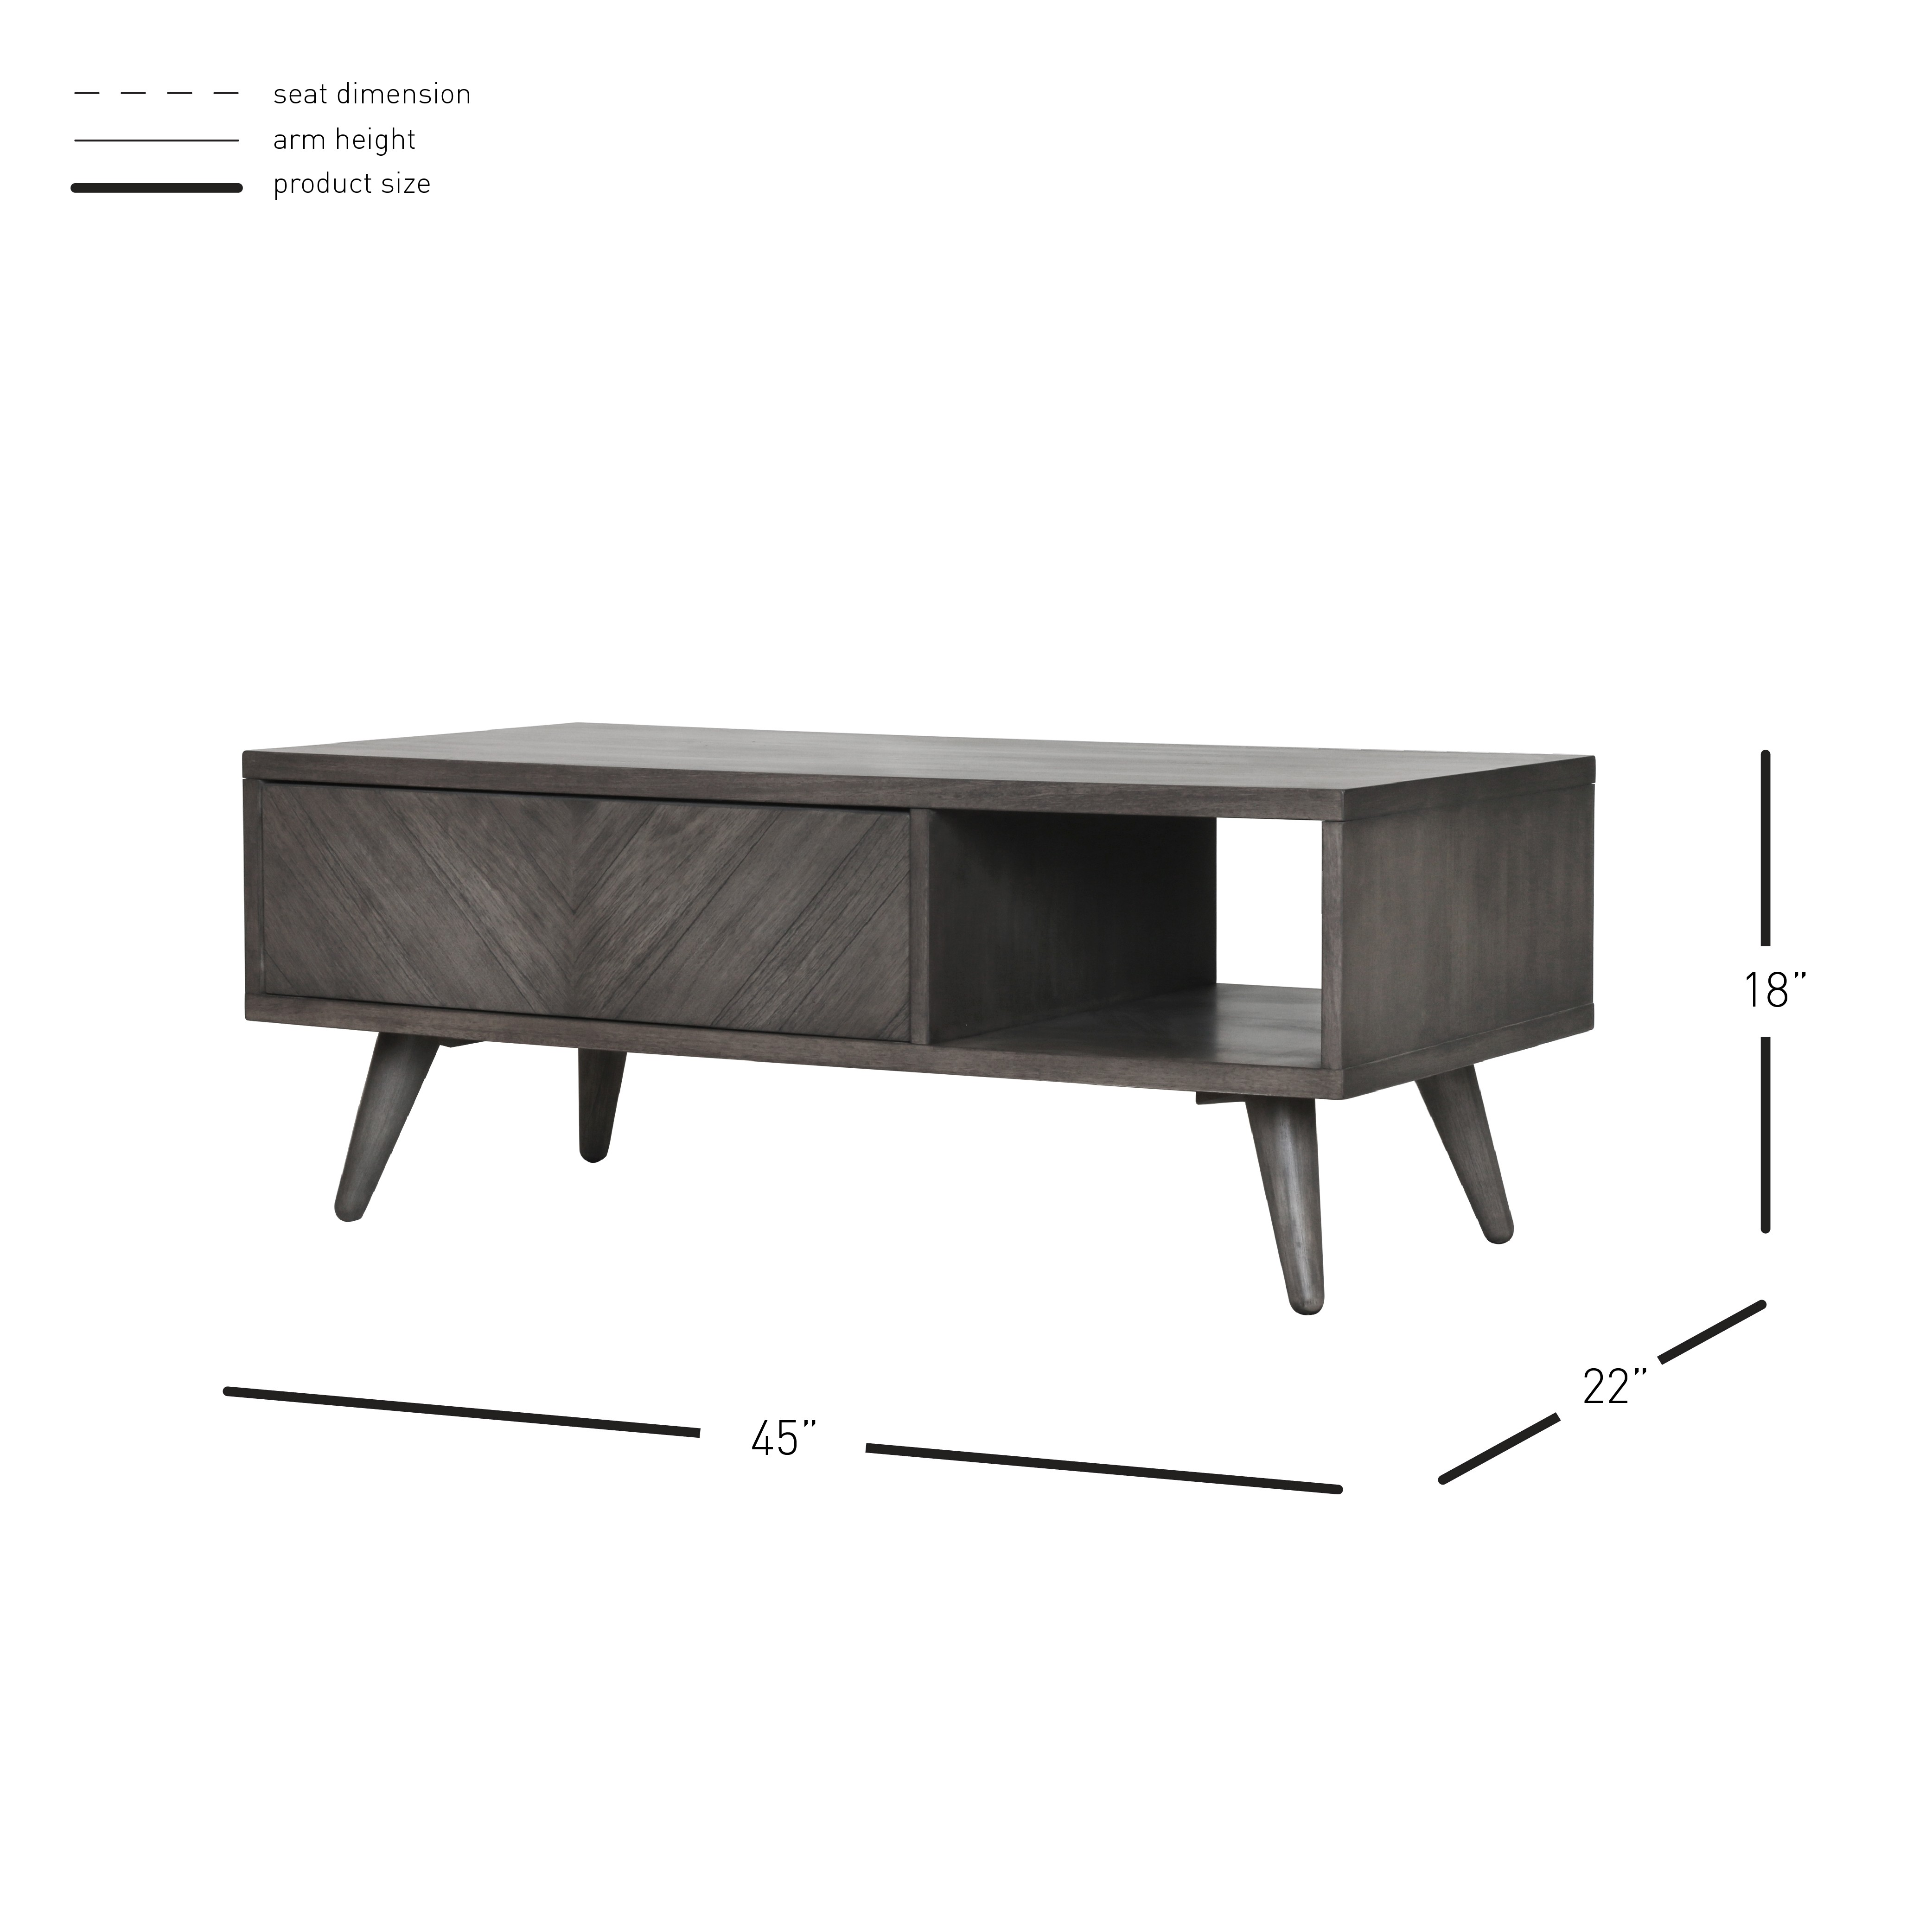 WG NPD Furniture